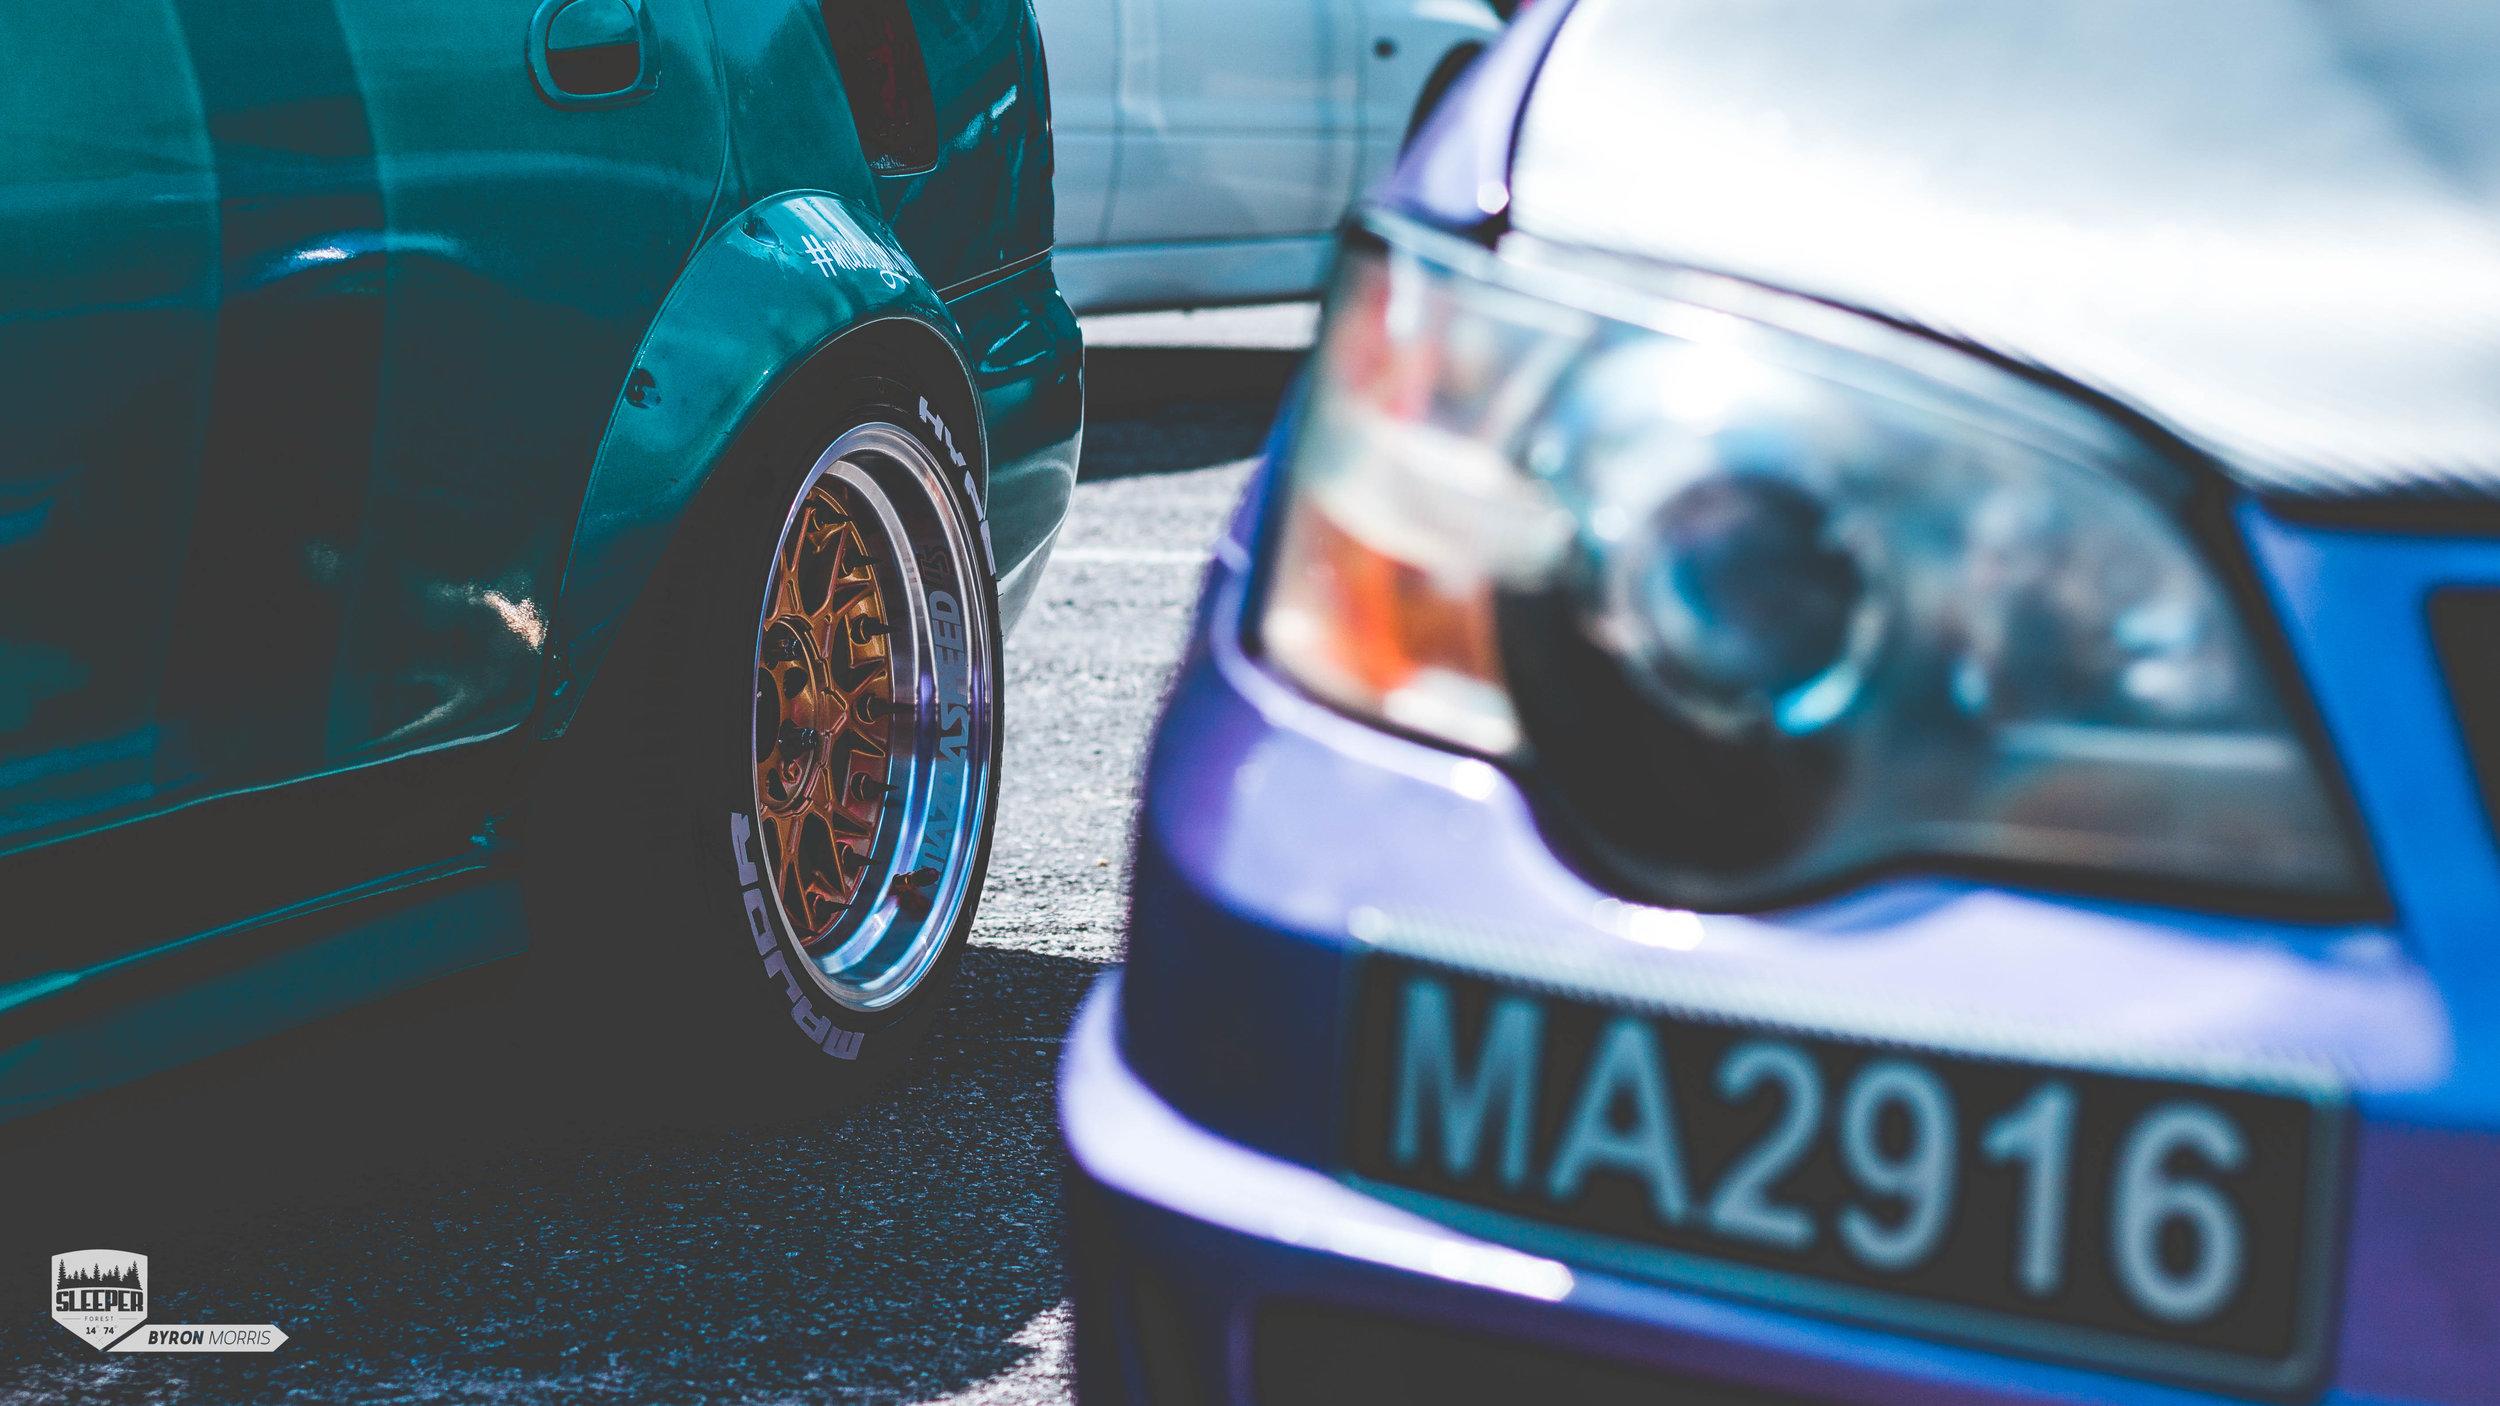 Rep_ya_ride_2019_barbados_car_culture-9.jpg